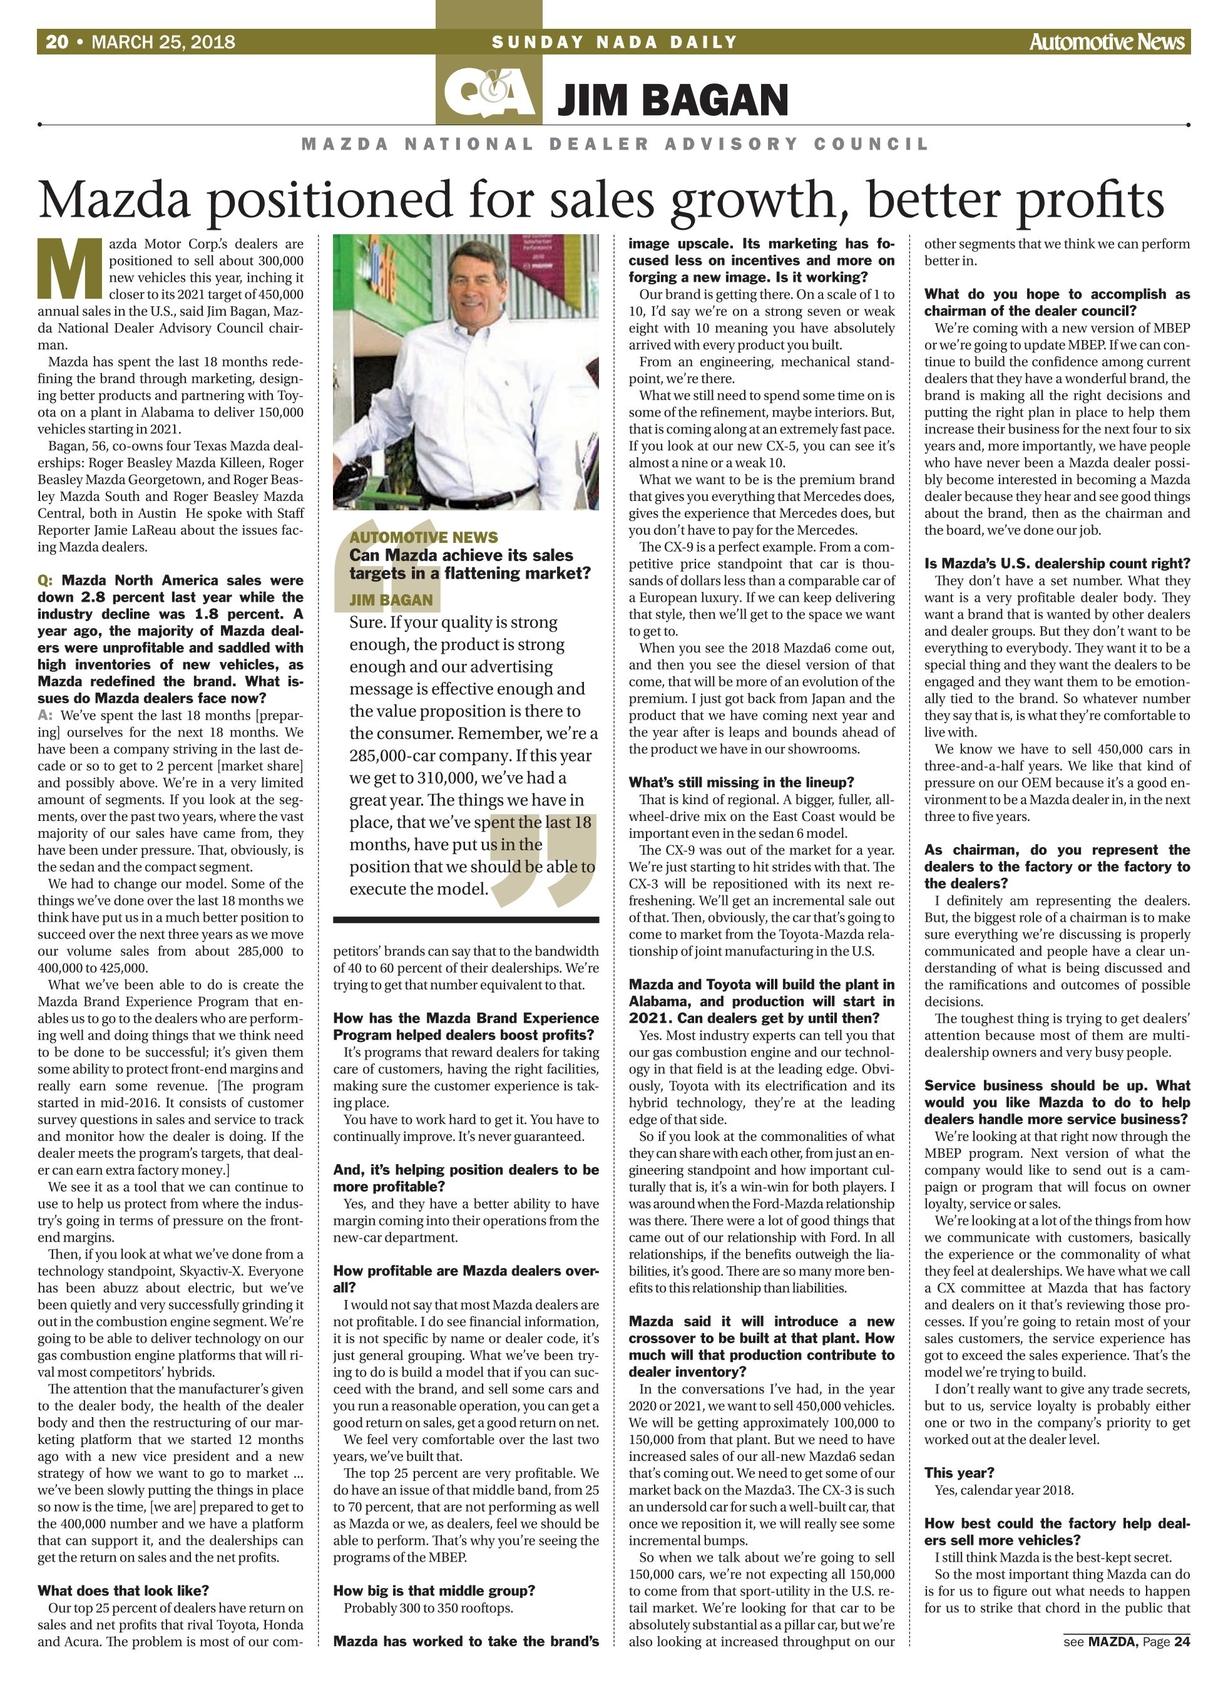 Automotive News NADA Show Daily 2018 Day 3 20 21